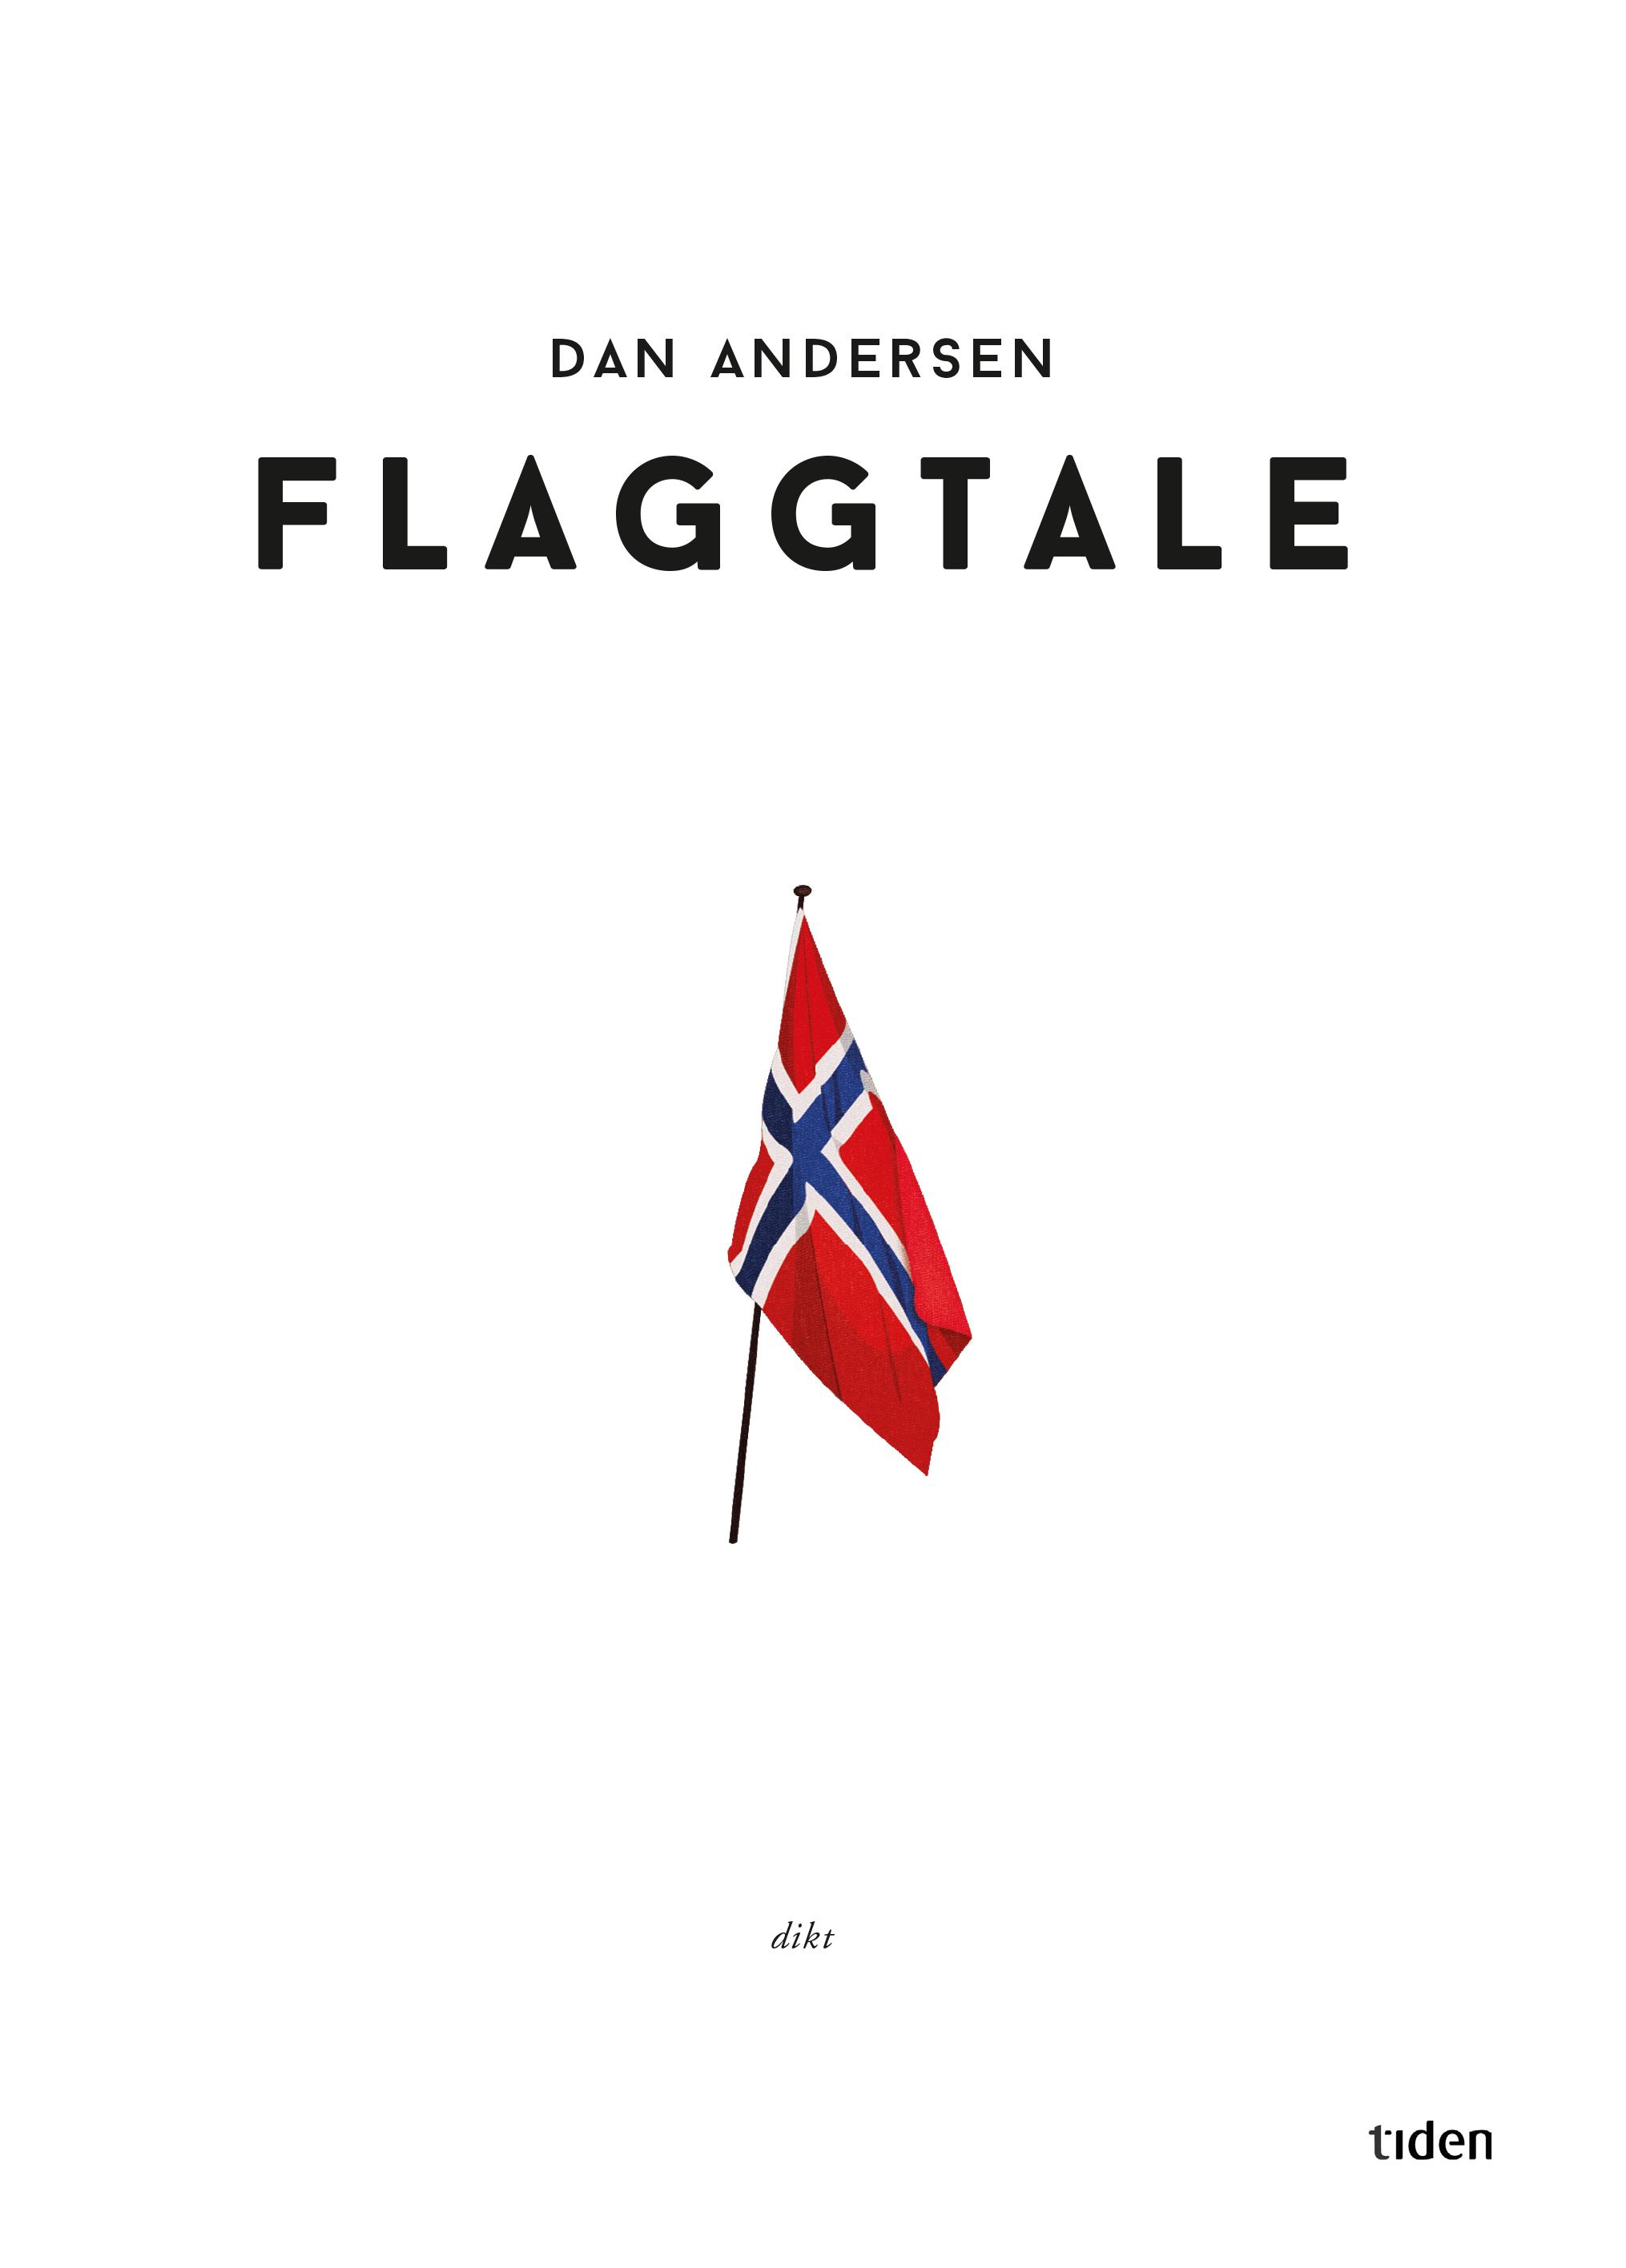 """Flaggtale - dikt"" av Dan Andersen"